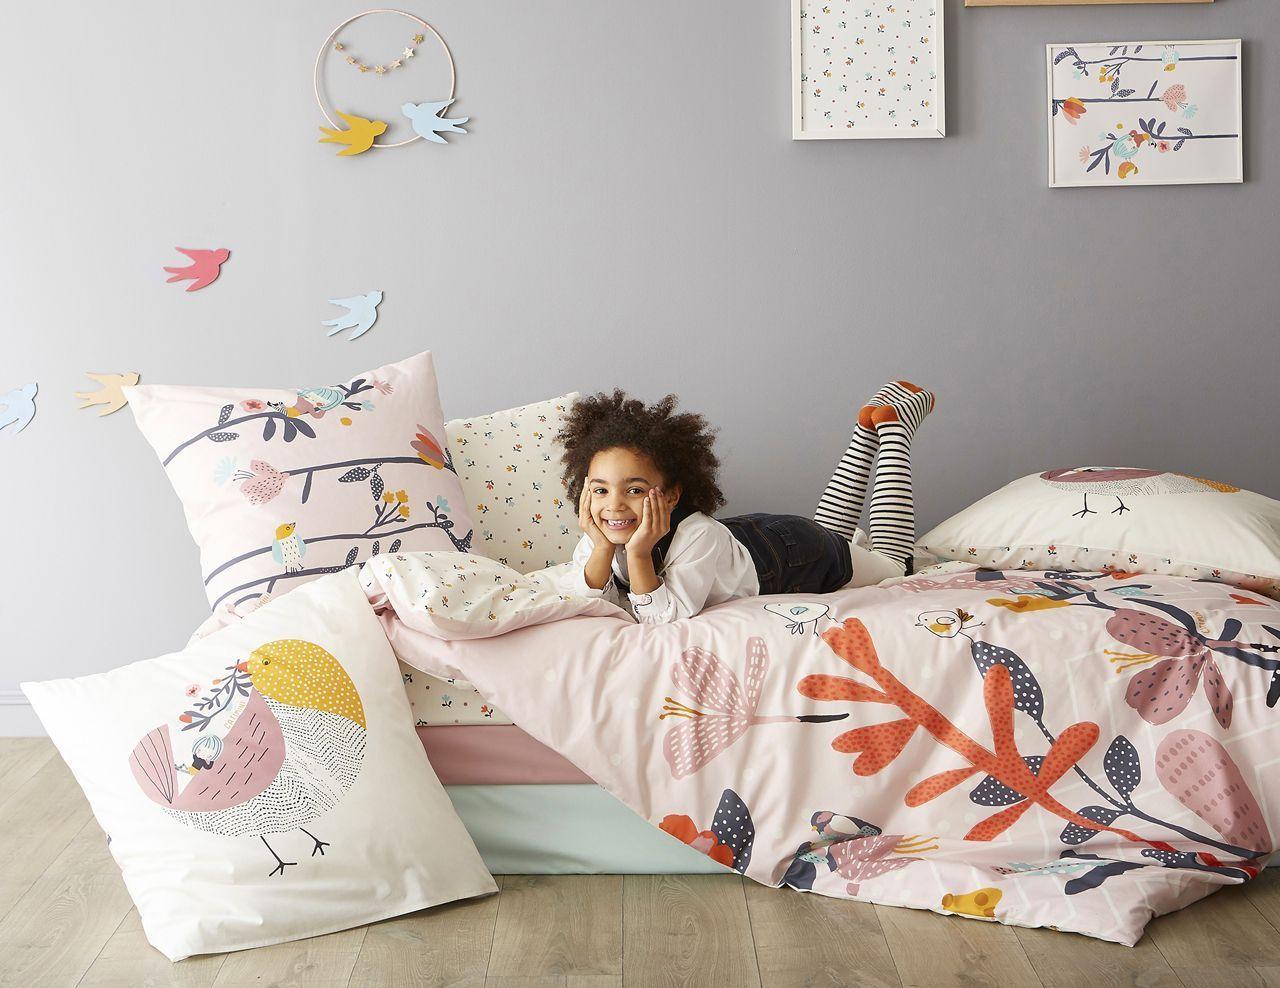 taie d 39 oreiller l 39 oiseau chanteur motifs nature pastel coton 50x75 oreiller chanteur et pastel. Black Bedroom Furniture Sets. Home Design Ideas